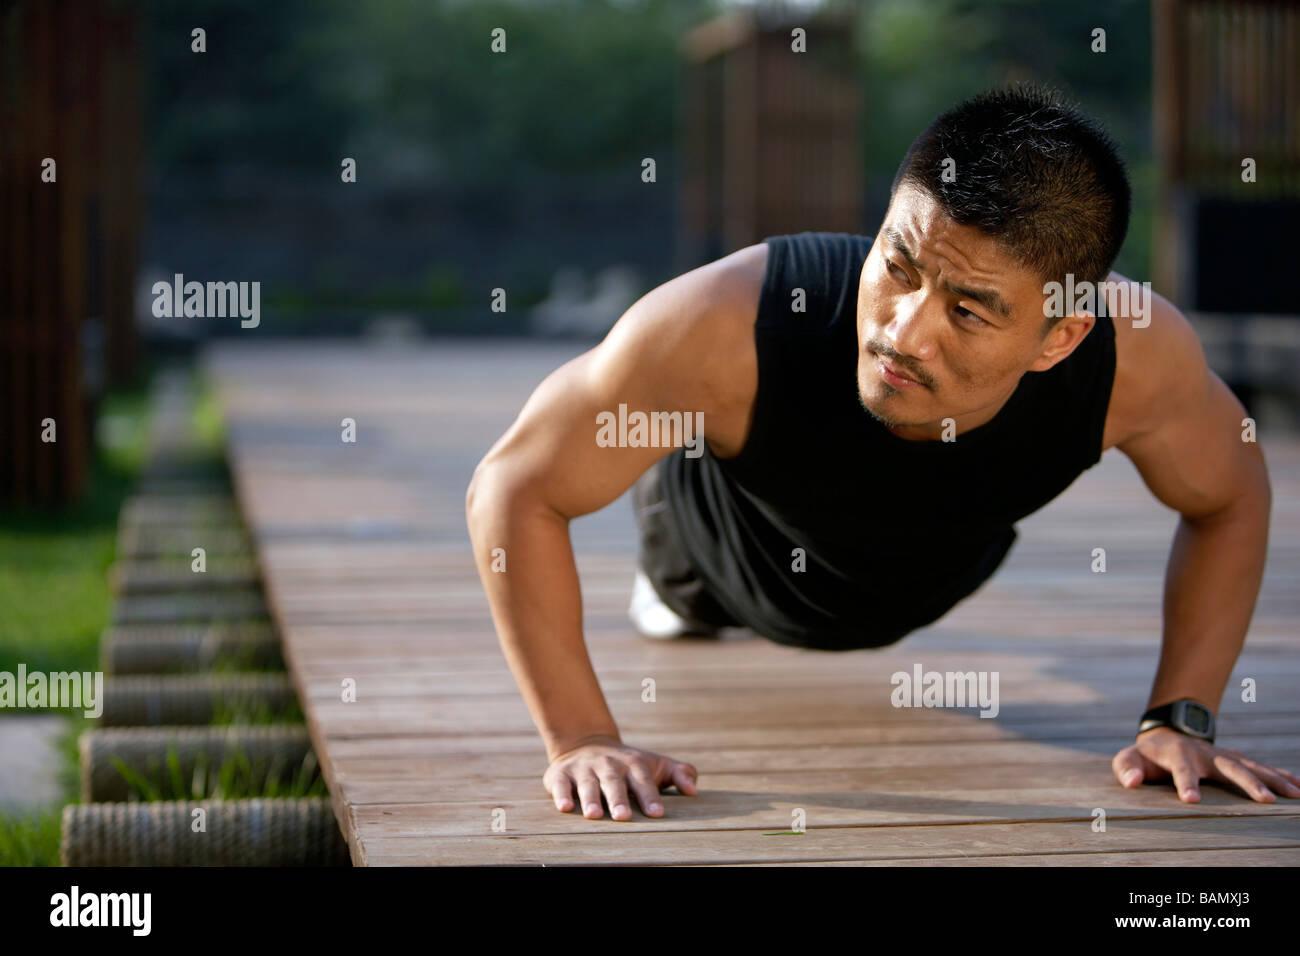 Man Doing Push-Ups - Stock Image